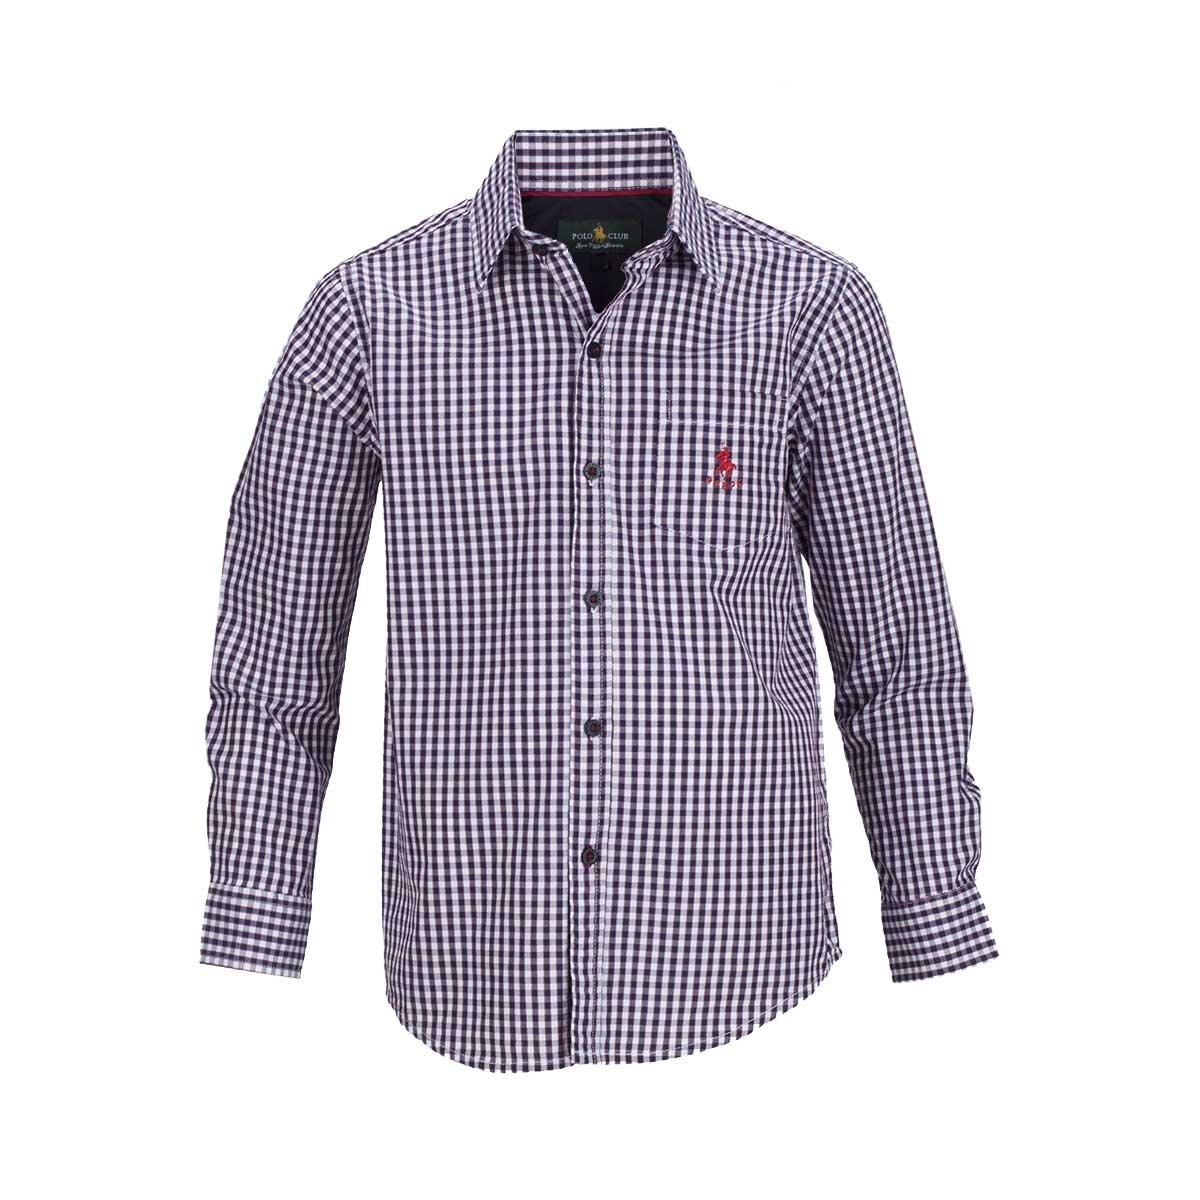 Camisa Cuadros Polo Club Sears Com Mx Me Entiende c52f7a3570134